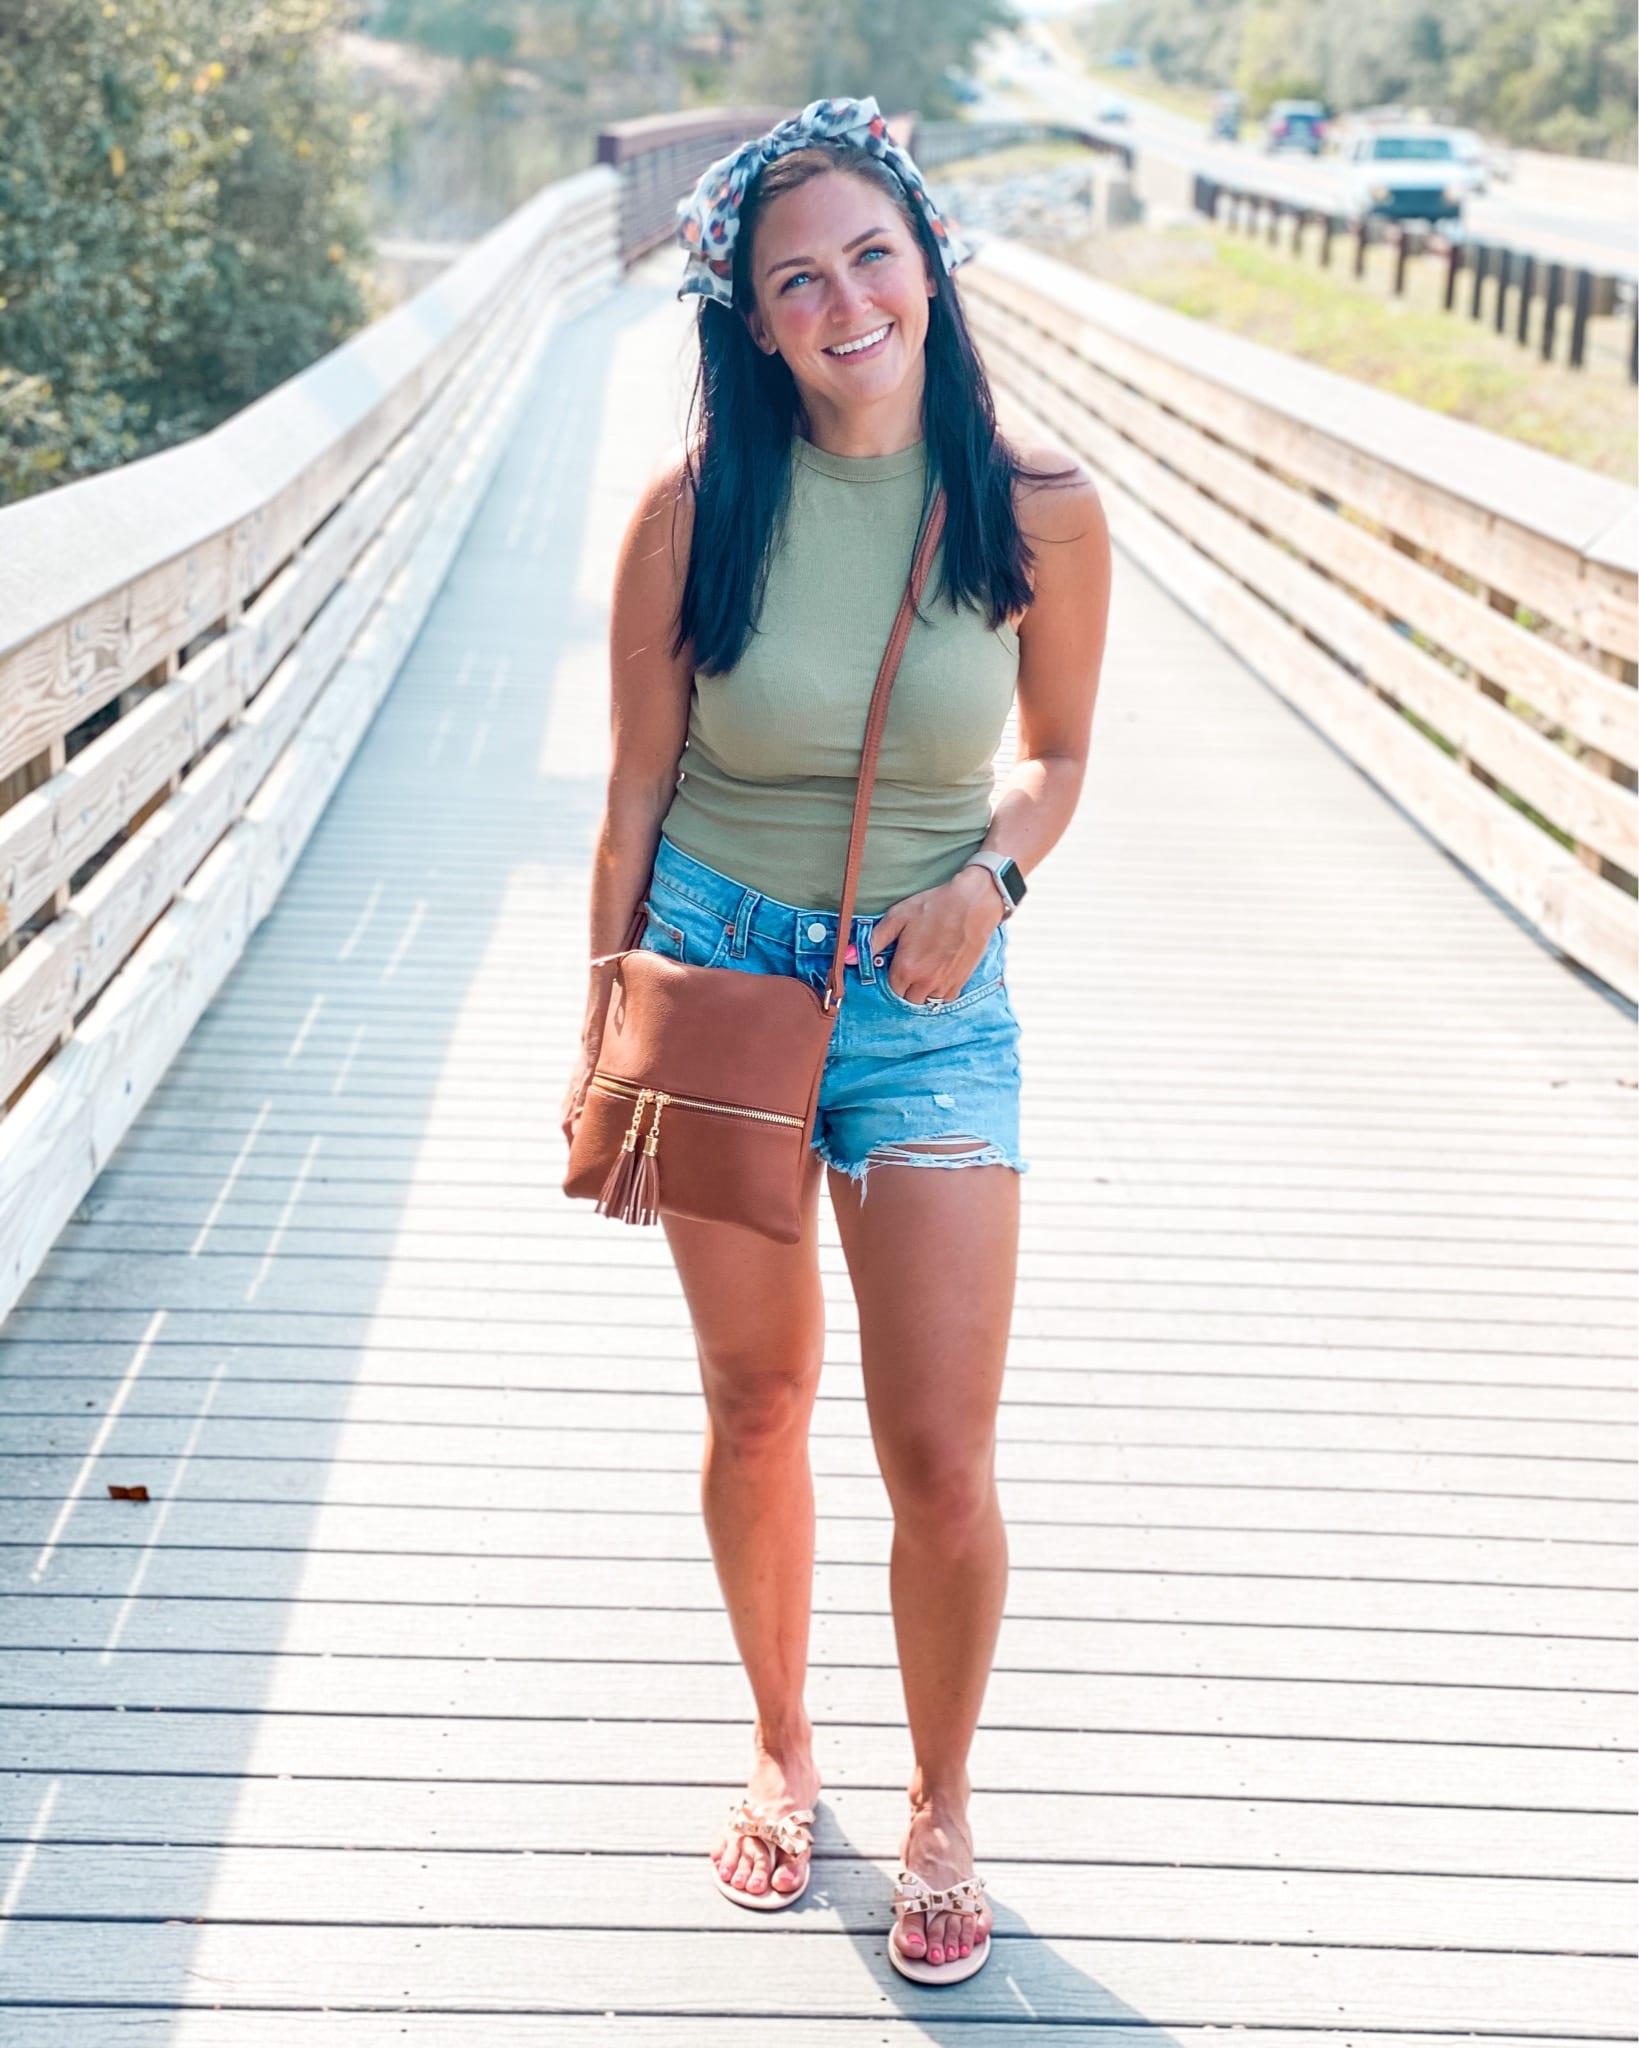 Summer Style, Tank top, best denim shorts, best crossbody bag, stilettos and diapers